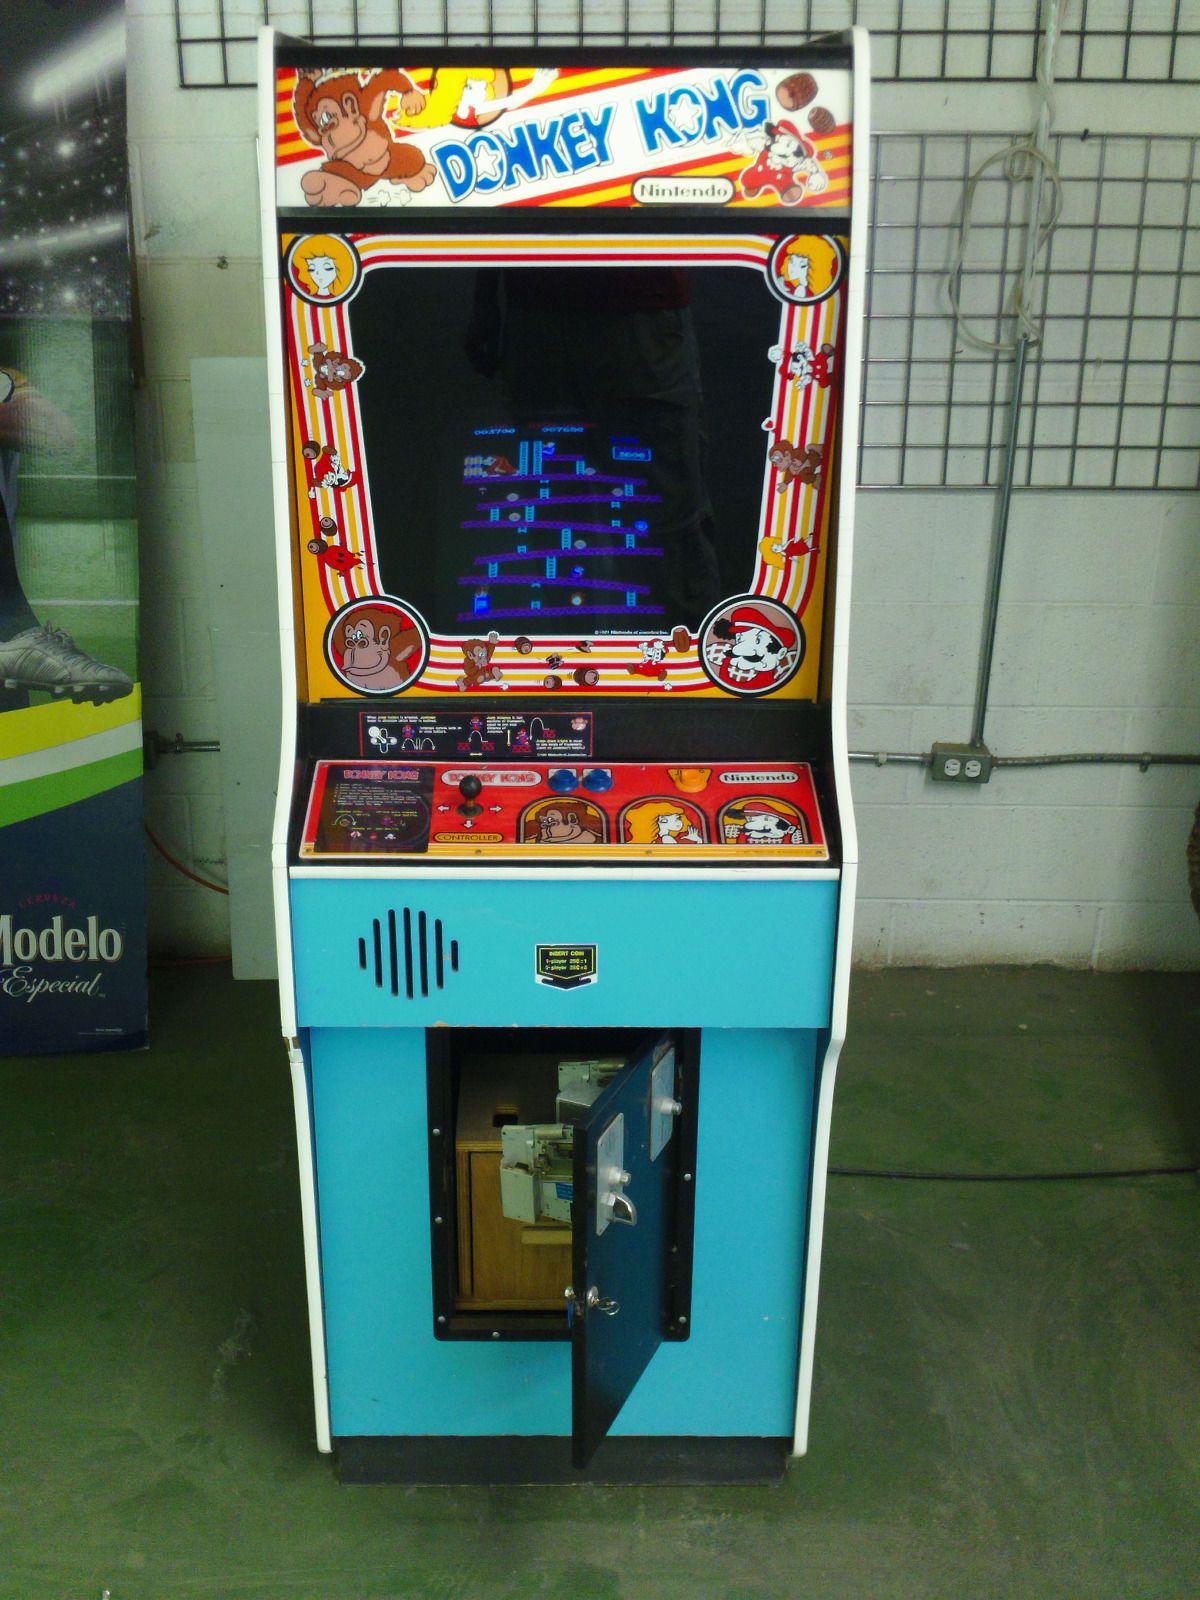 Details about Donkey Kong 1981 Classic Arcade Donkey